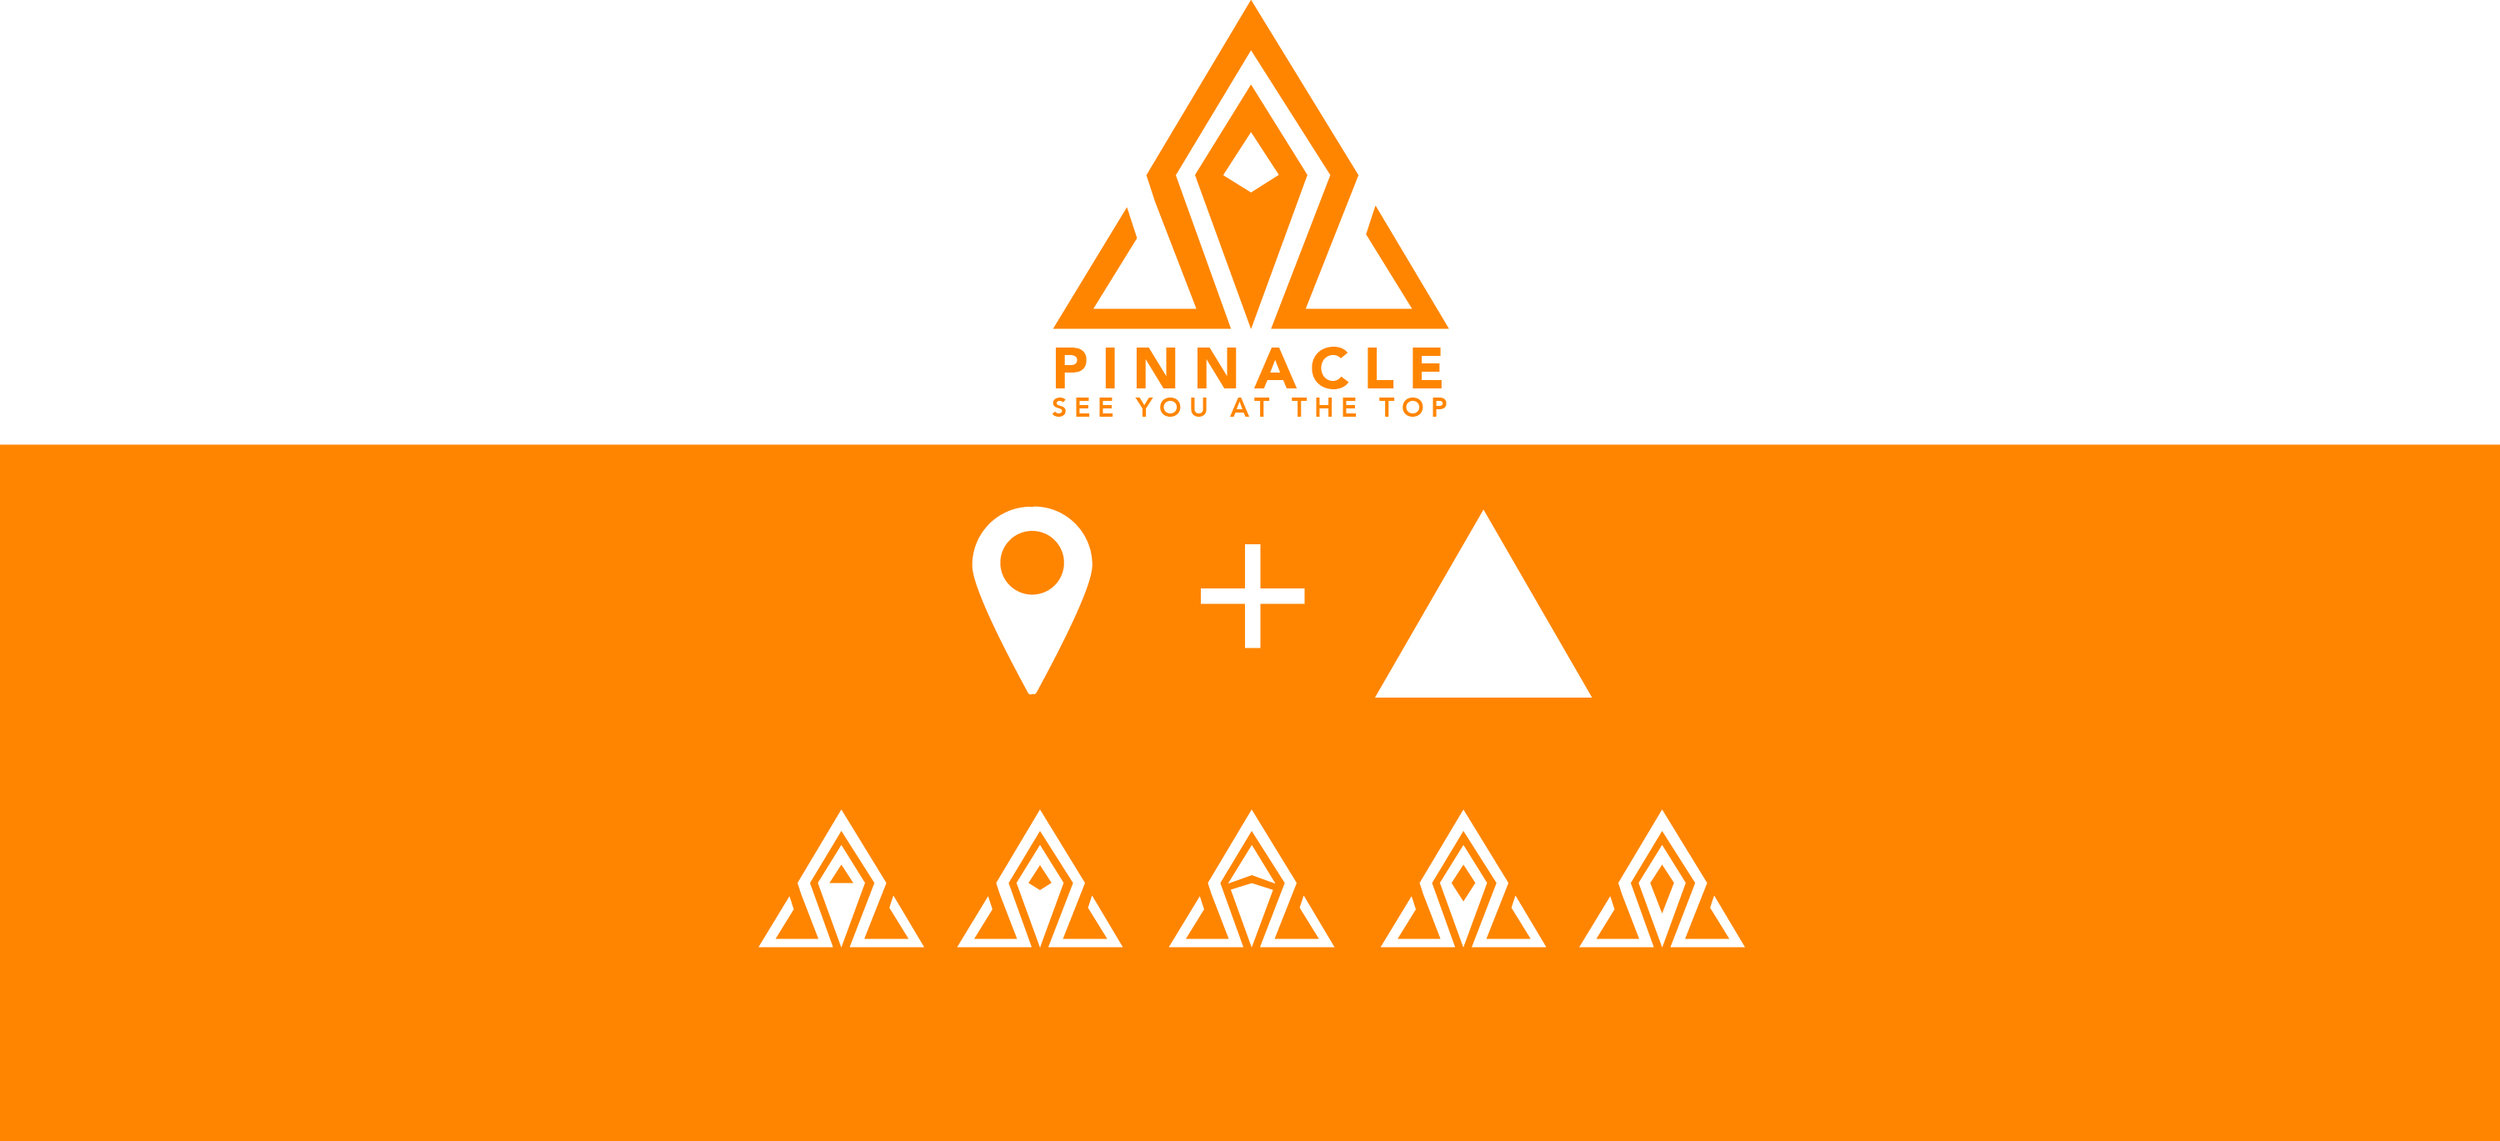 PINNACLE_LOGO_STUDY.jpg